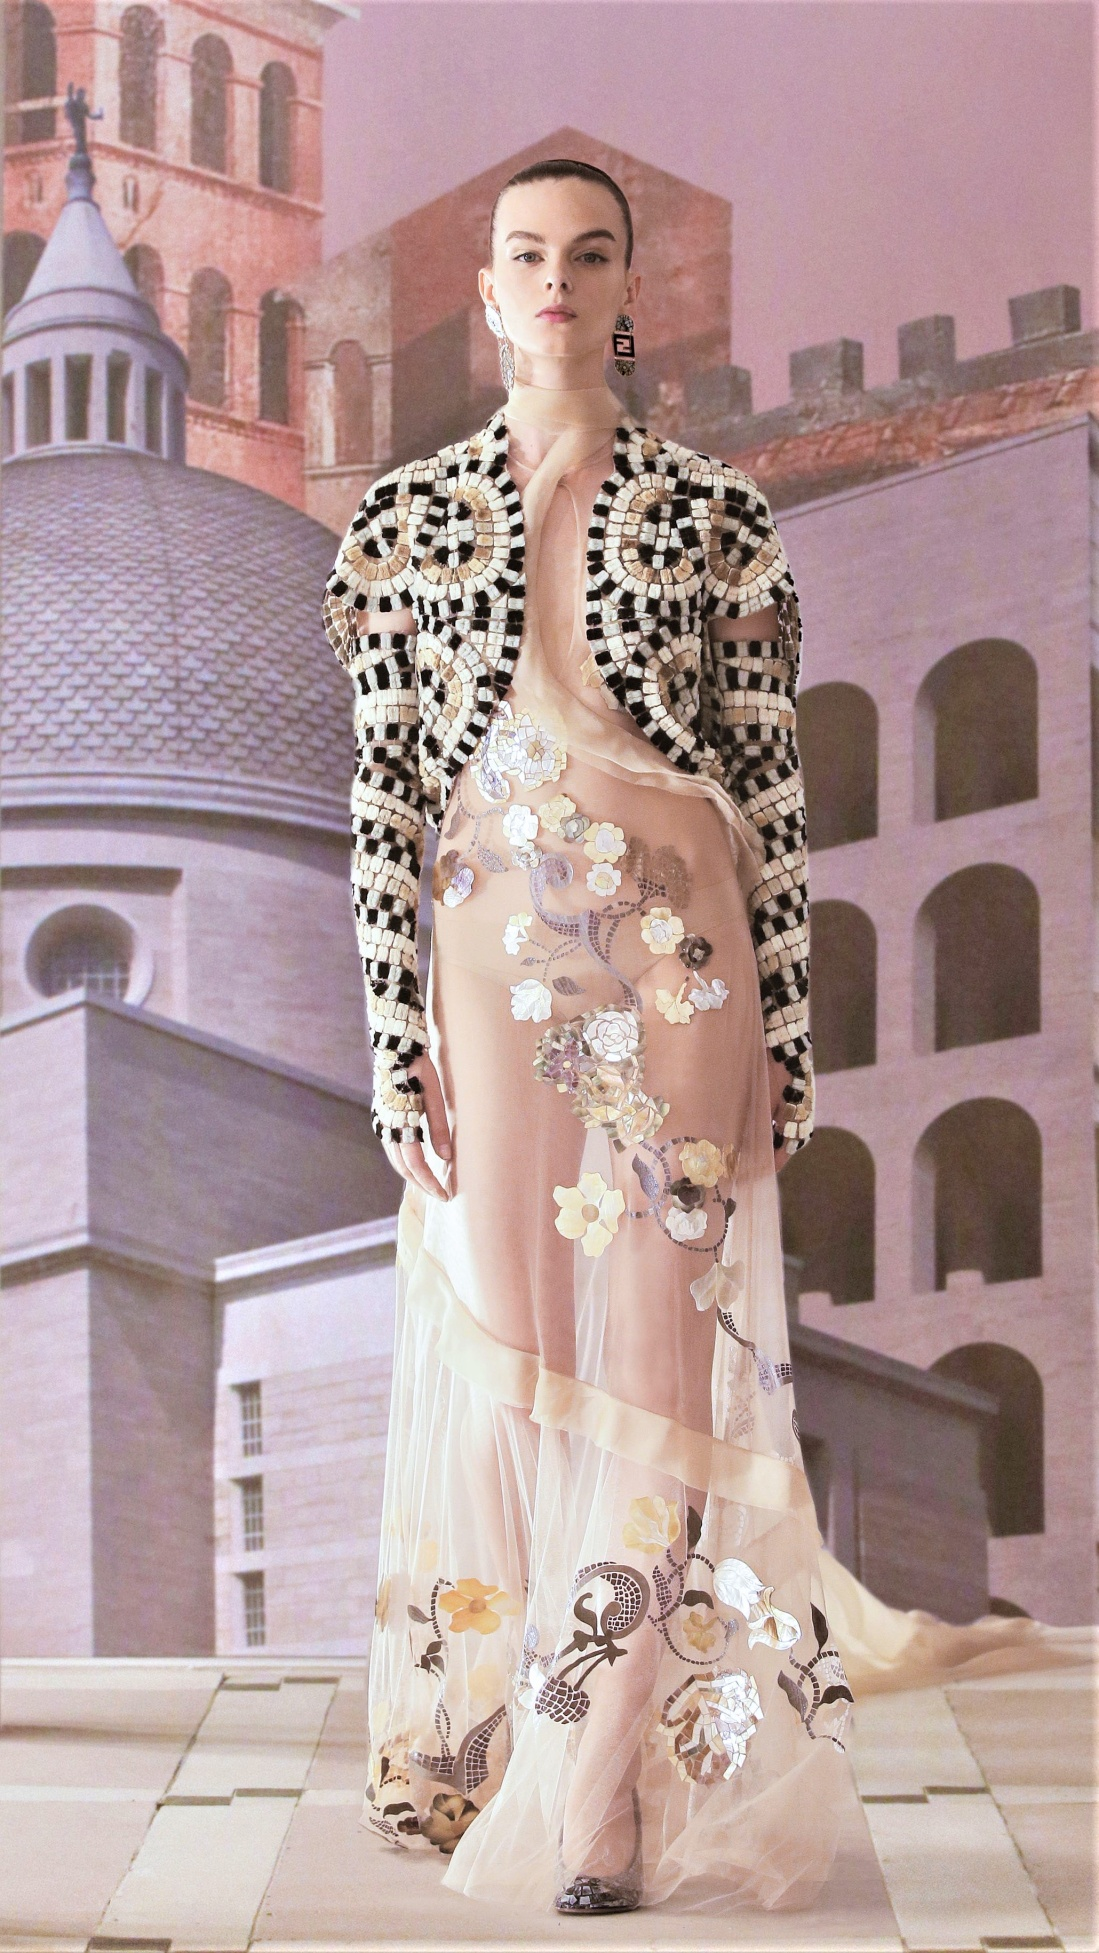 Fendi Couture Fall 2021 mosaic jkt vogue cropped.jpg